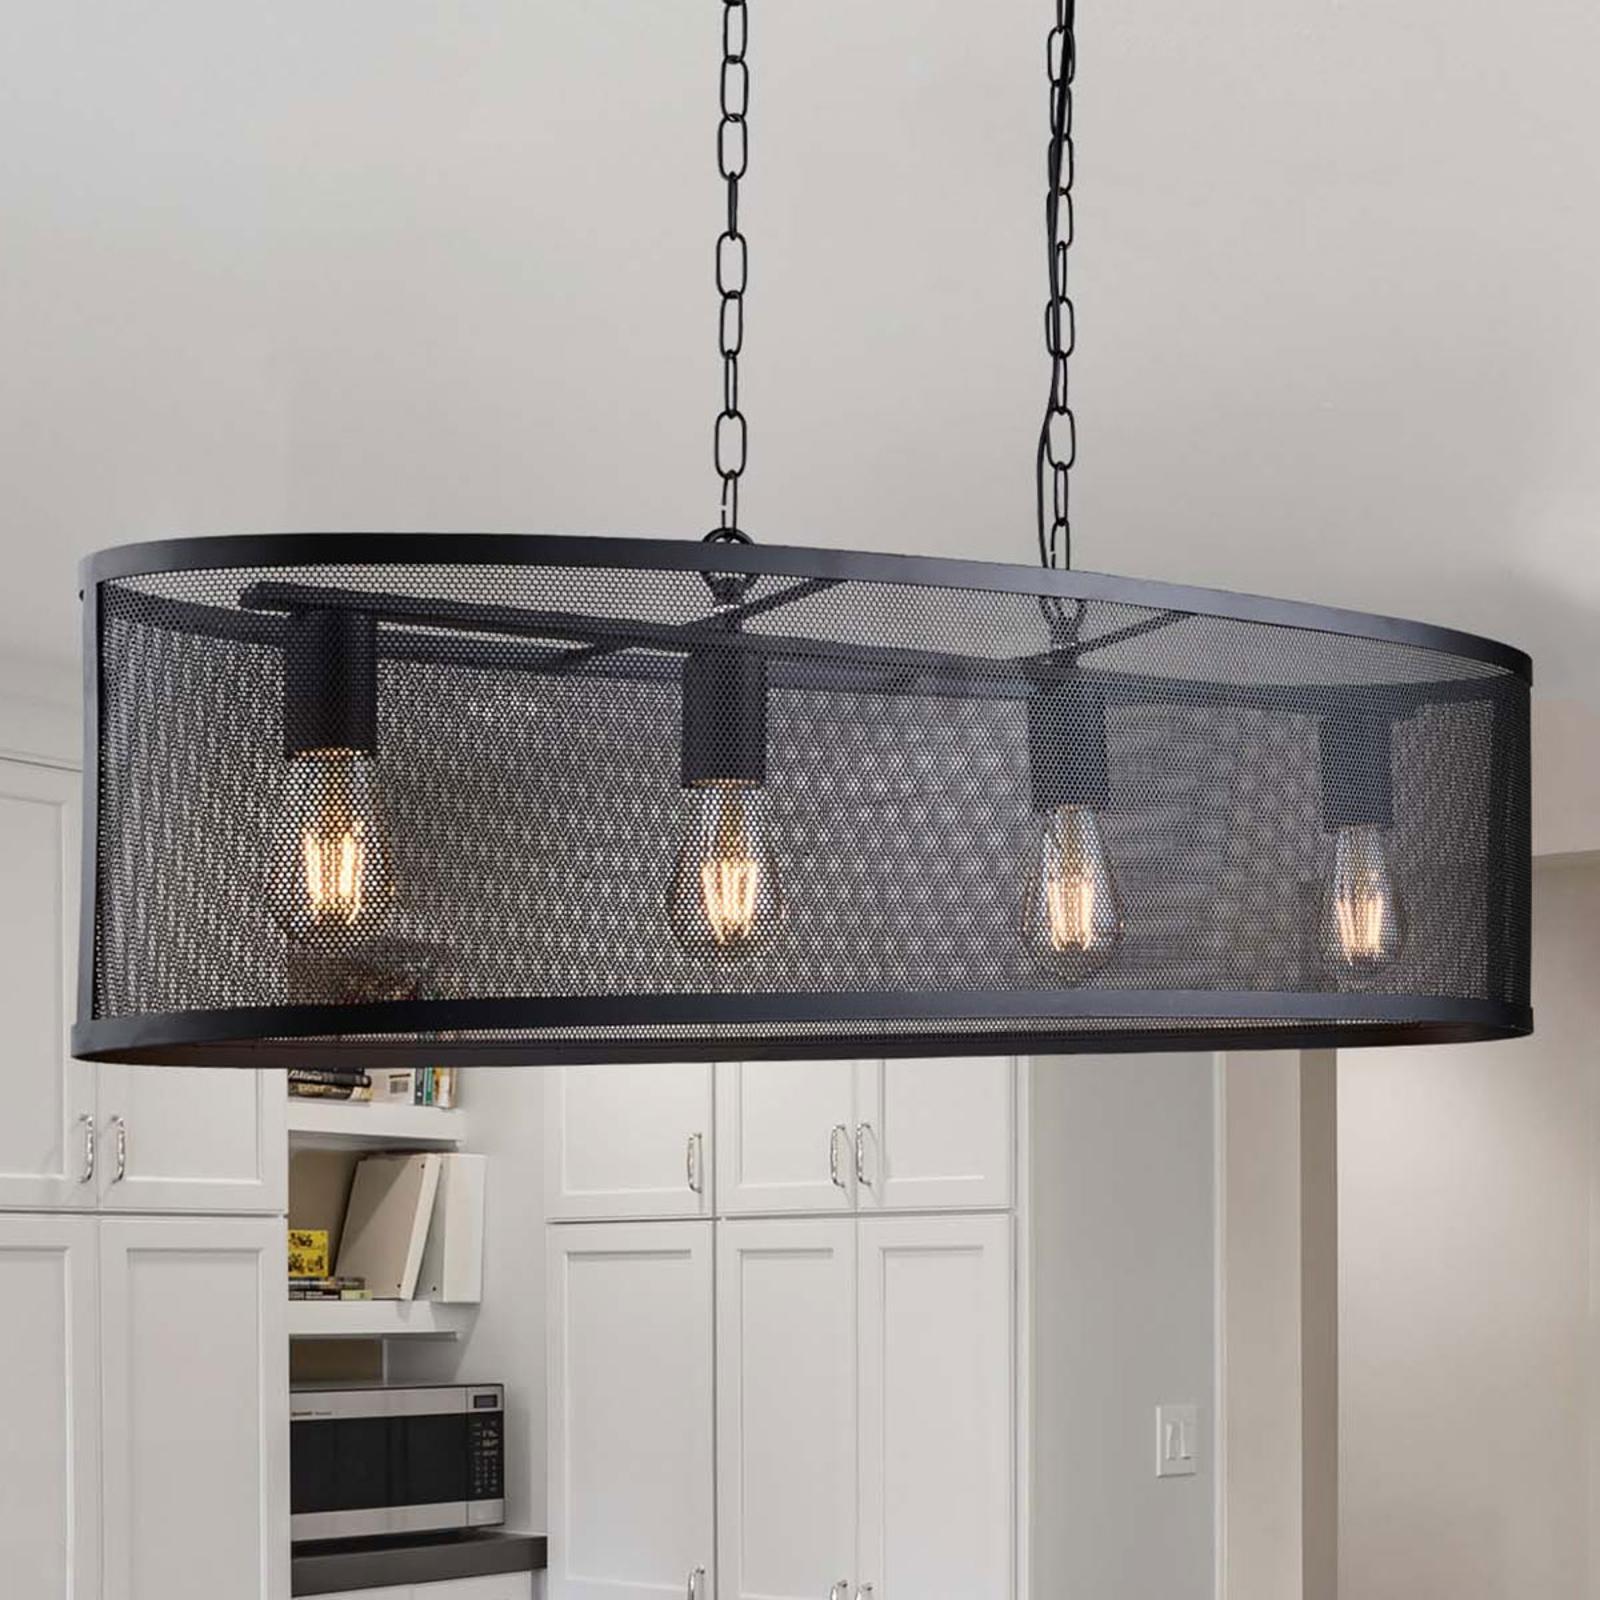 Hanglamp Fishnet in zwart, 91cm lang